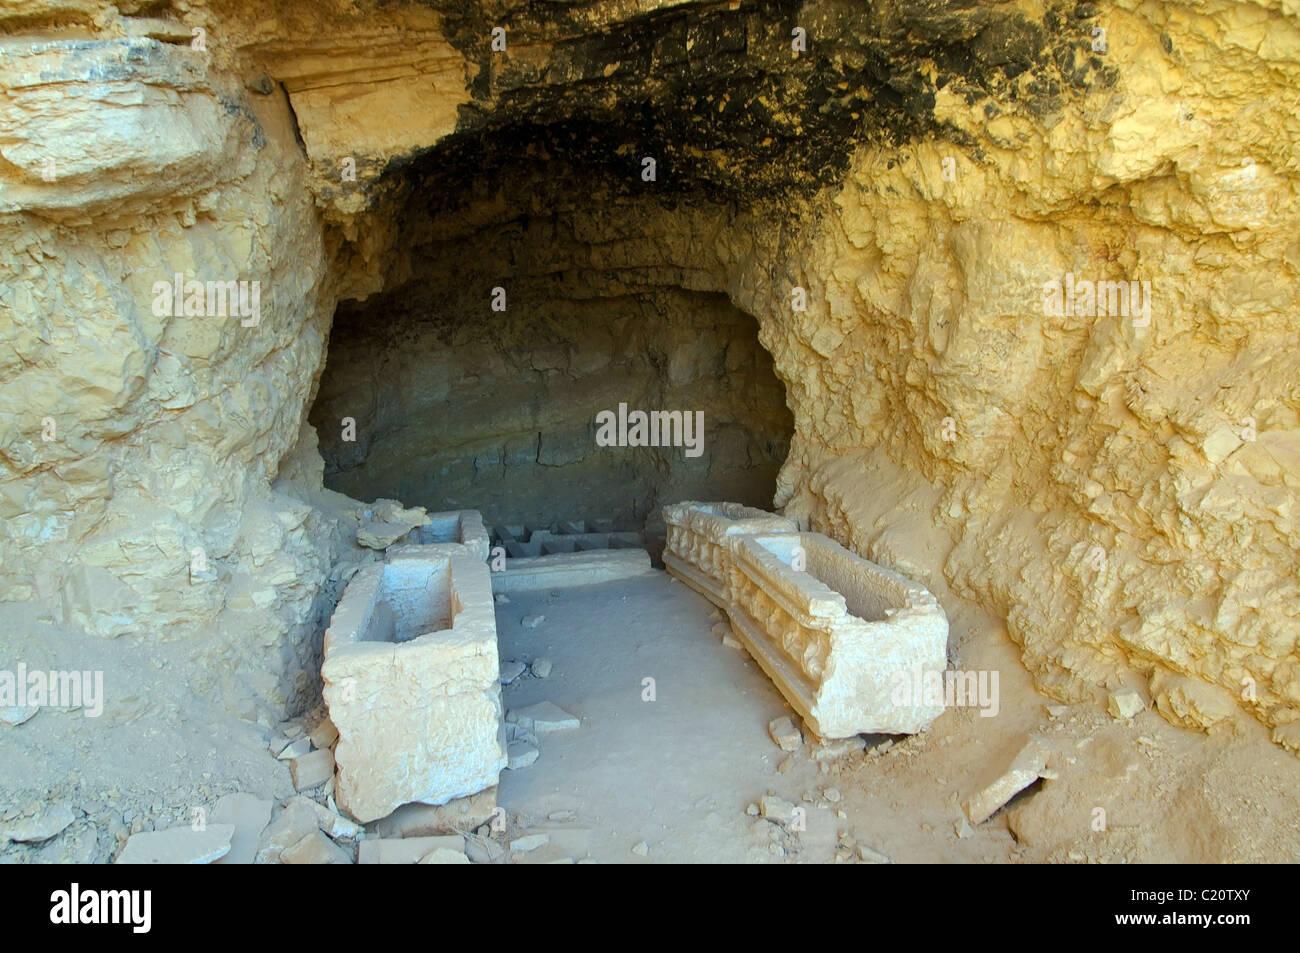 the interior of the underground tomb, Palmyra, Syria - Stock Image